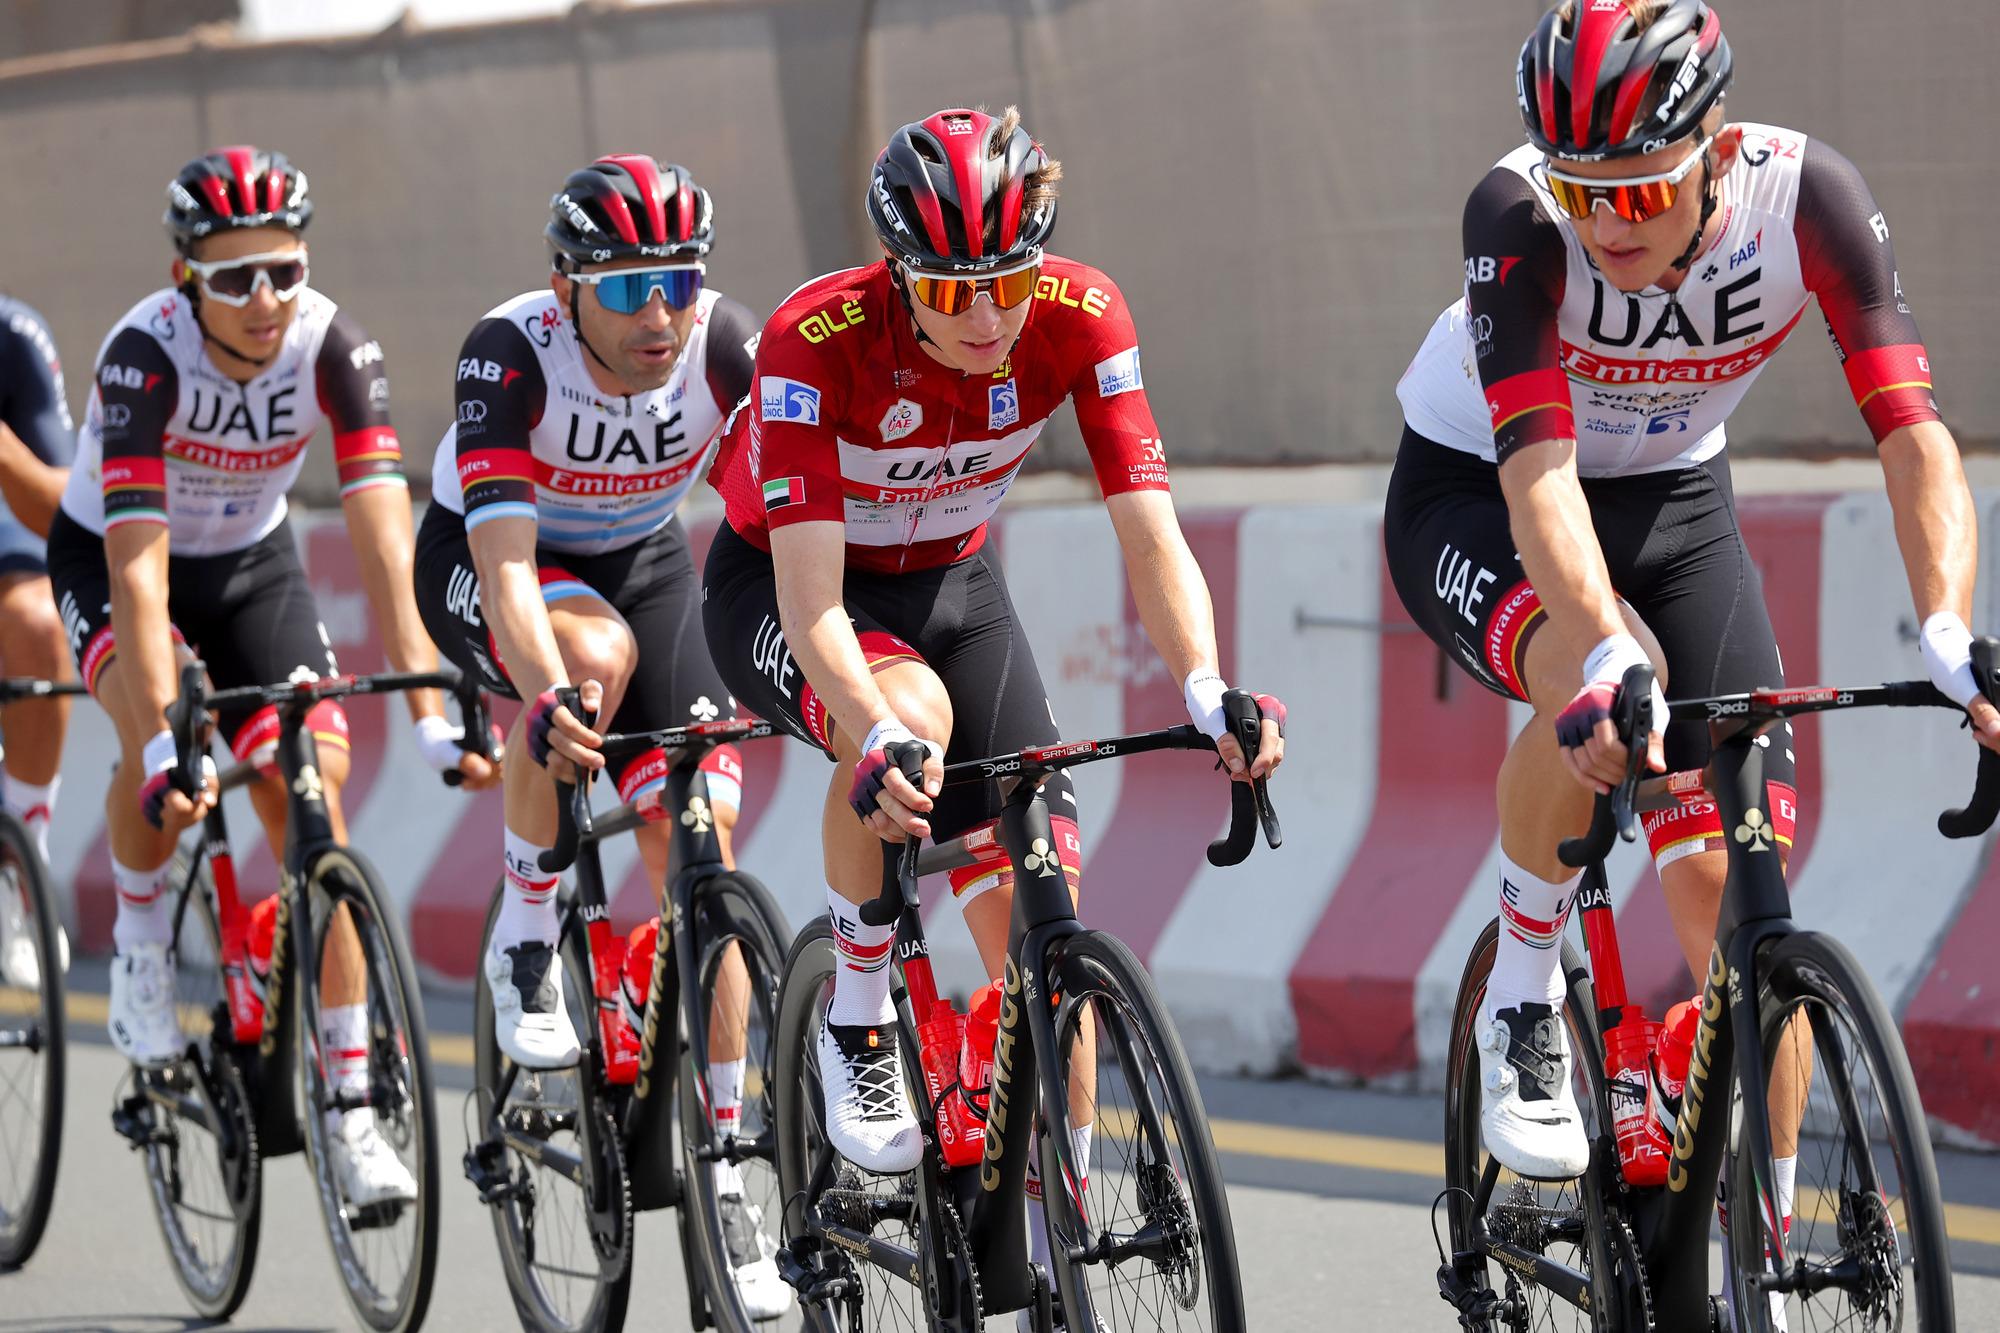 UAE Tour 2021 3rd Edition 6th stage Deira Island Palm Jumeirah 165 km 26022021 Tadej Pogacar SLO UAE Team Emirates photo Luca BettiniBettiniPhoto2021